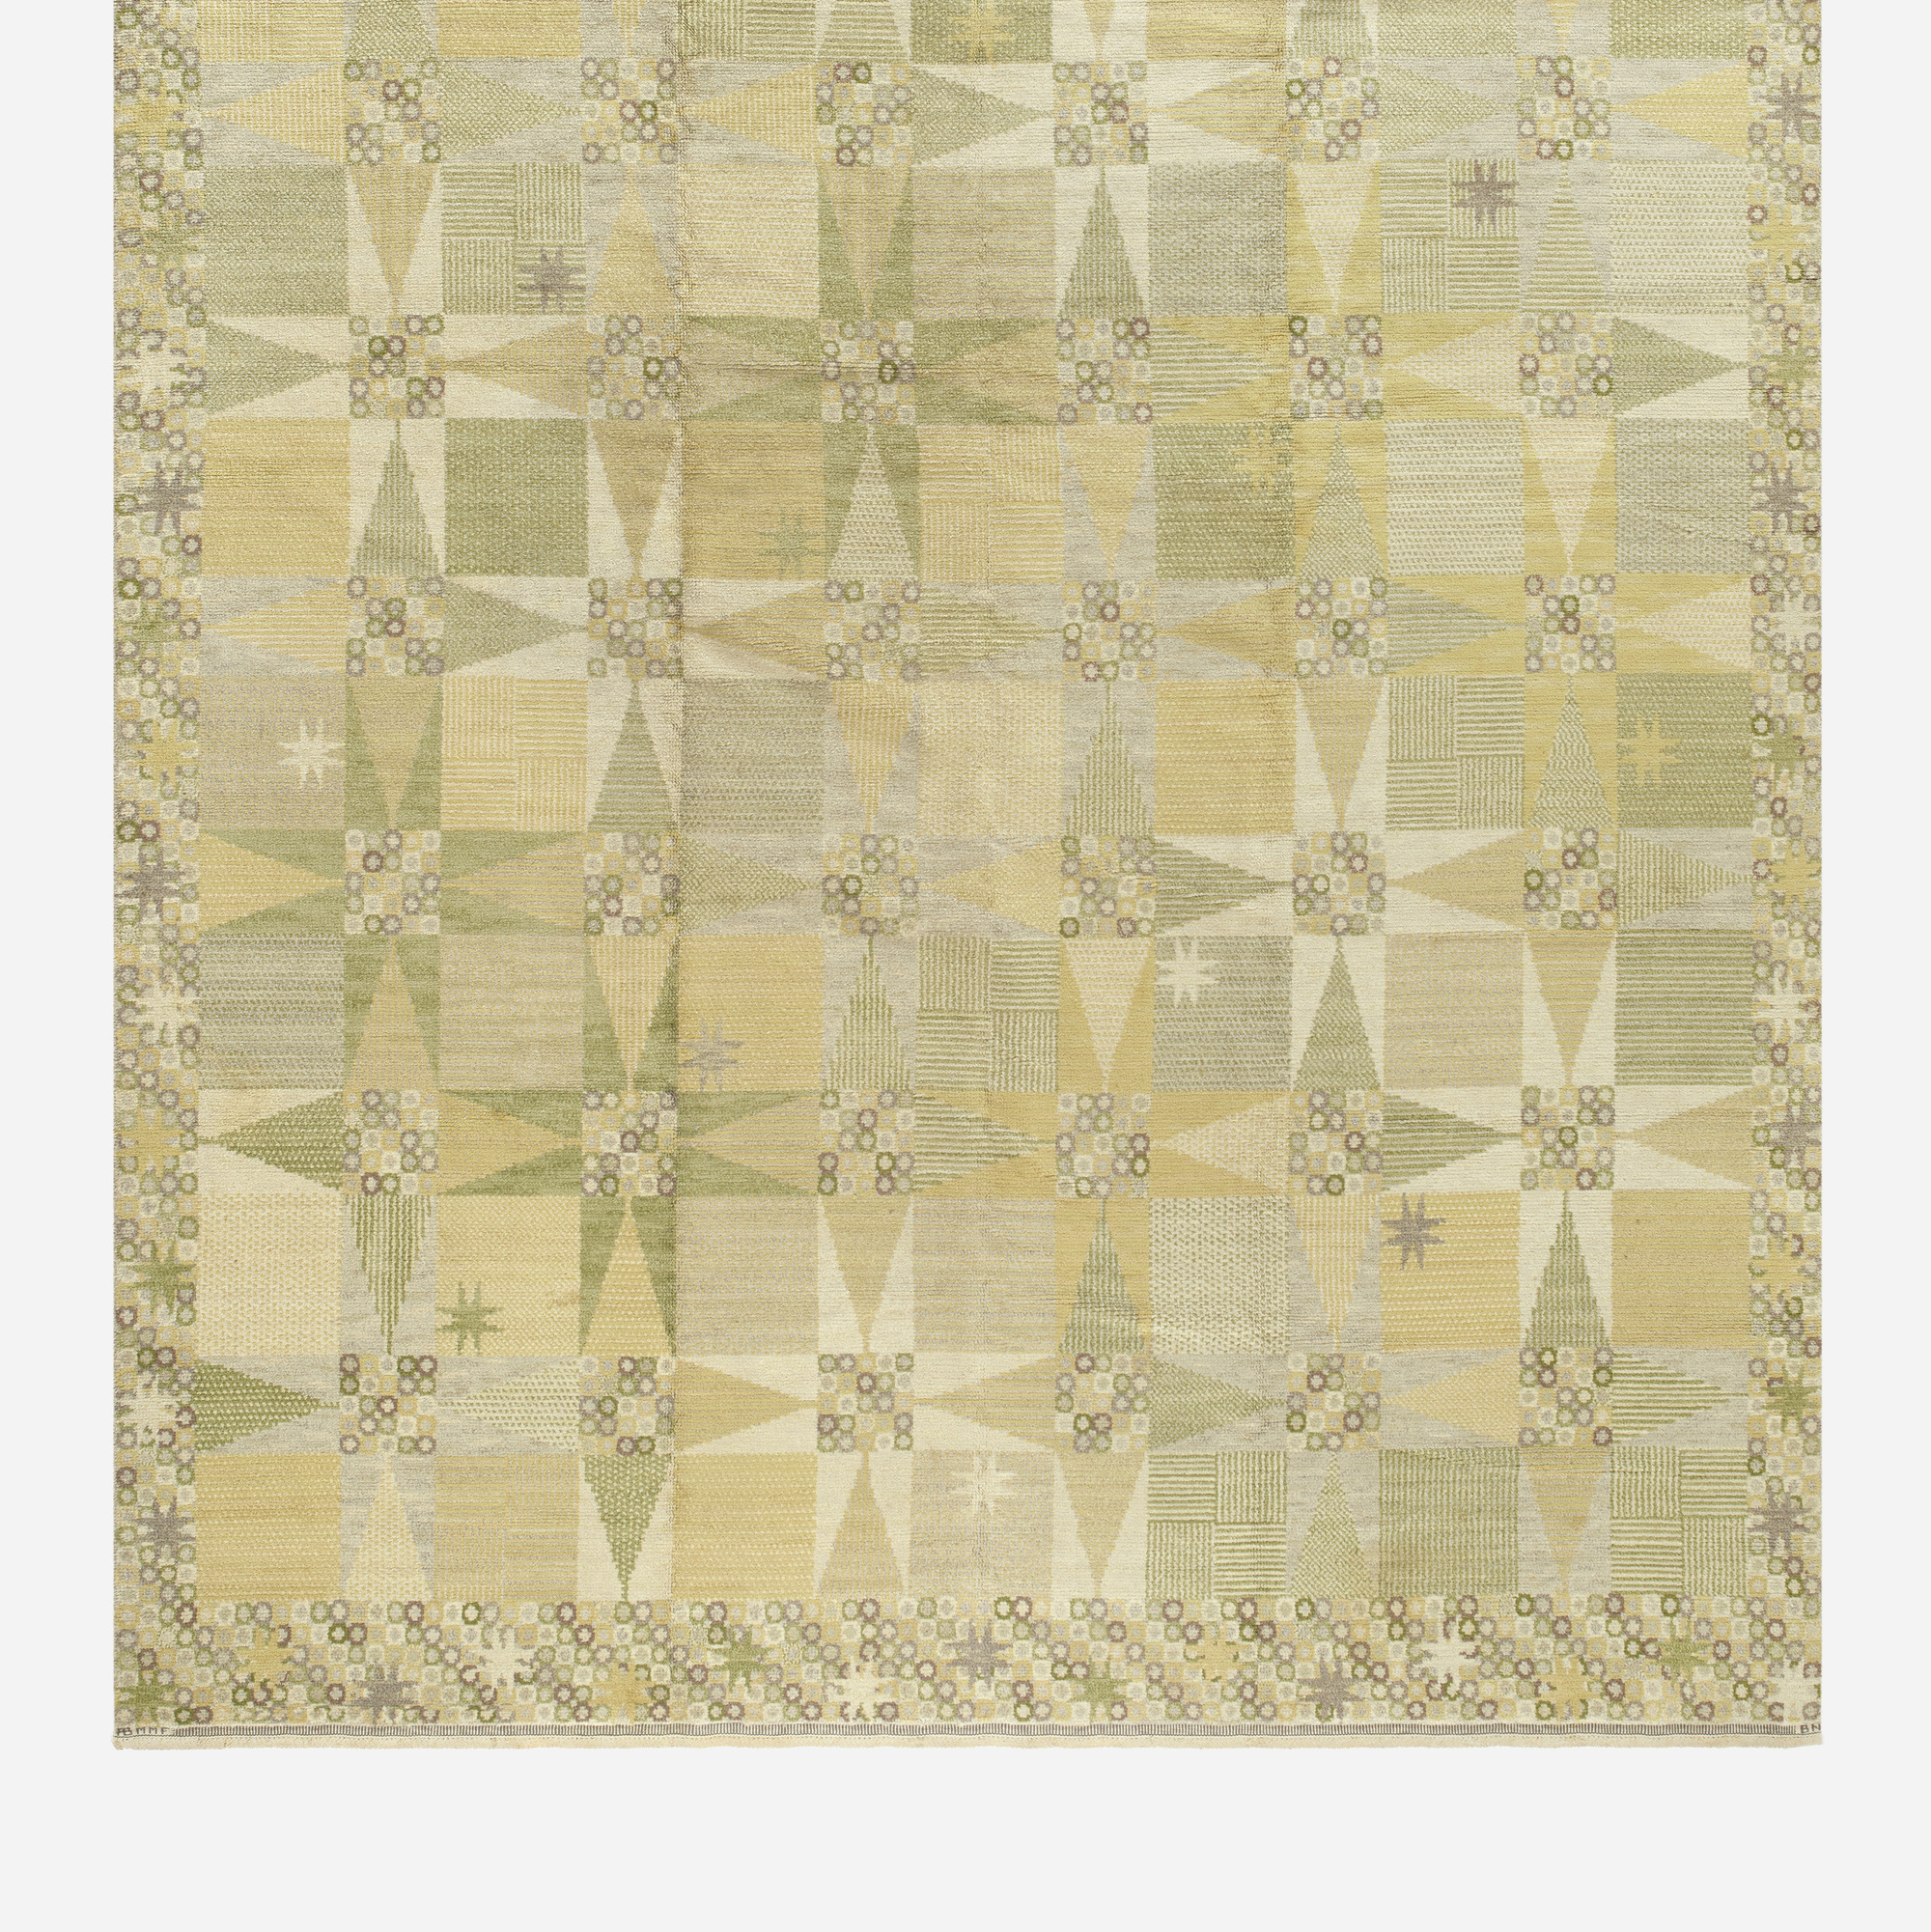 184: Barbro Nilsson / Stjärnflossan pile carpet (2 of 2)